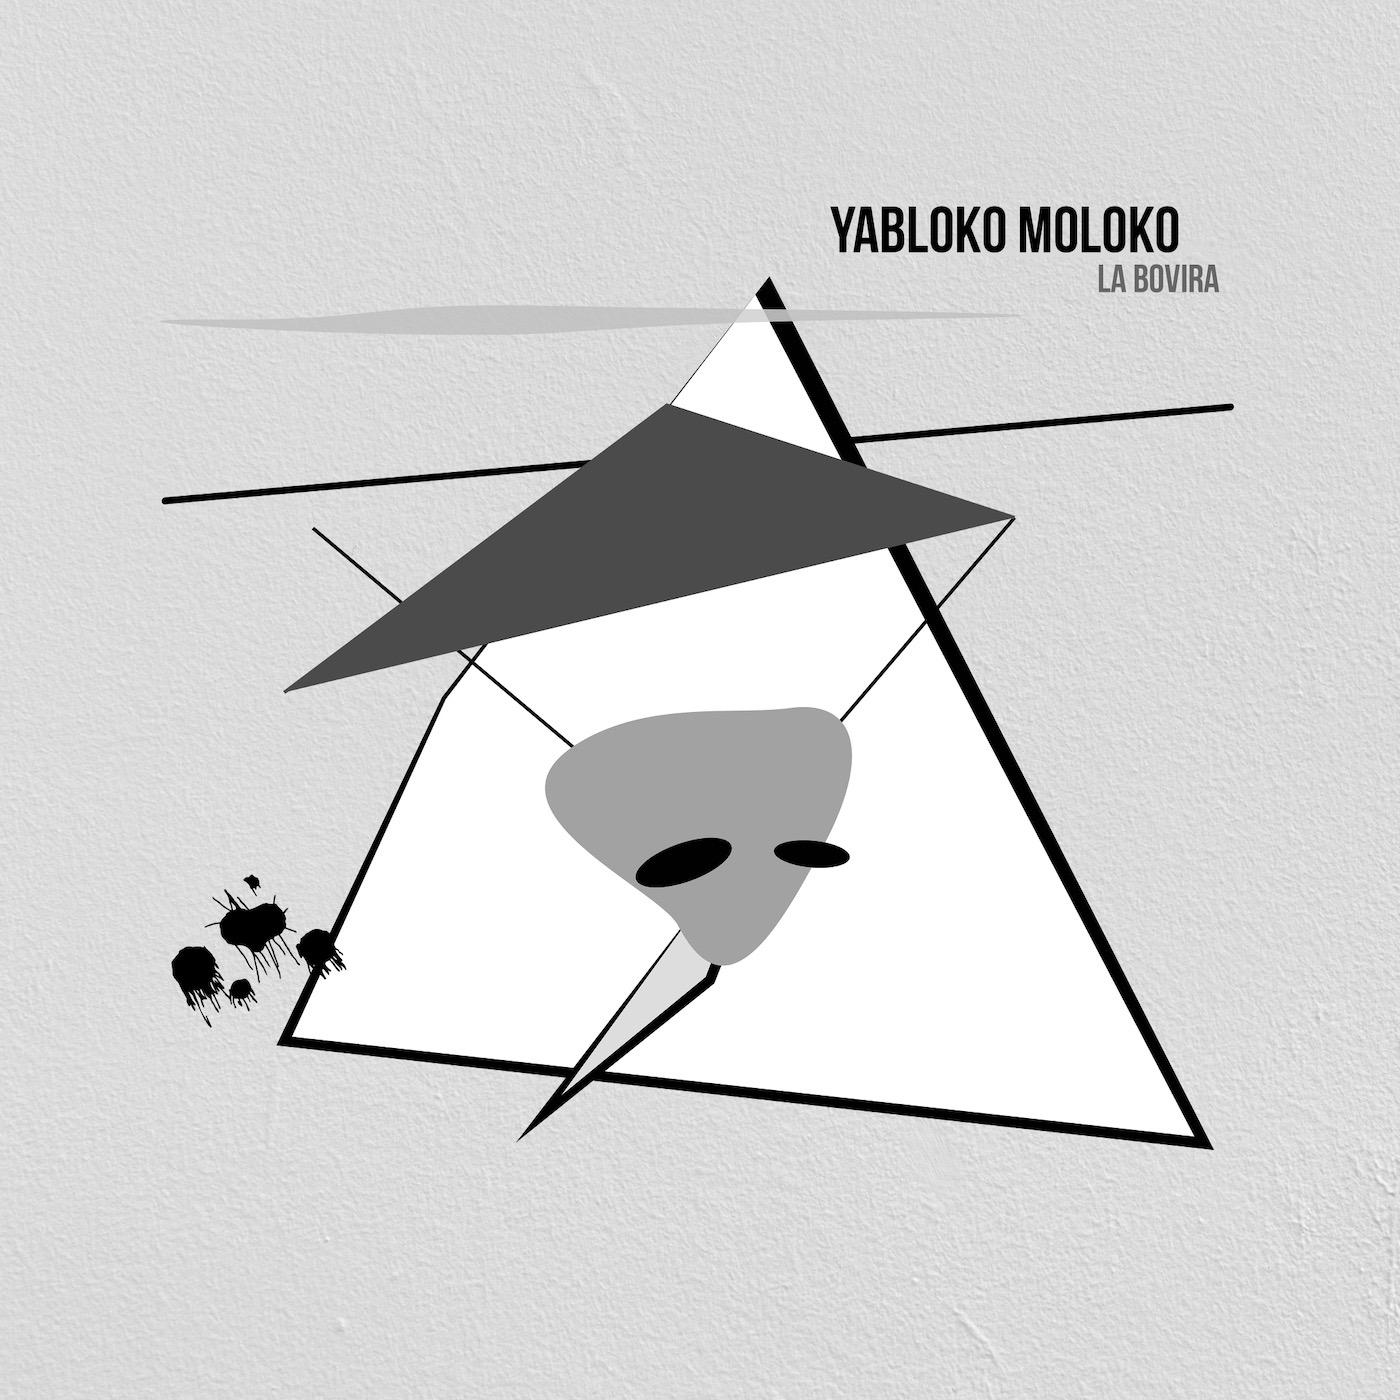 La Bovira Artwork - Electro Swing by Yabloko Moloko from Barcelona